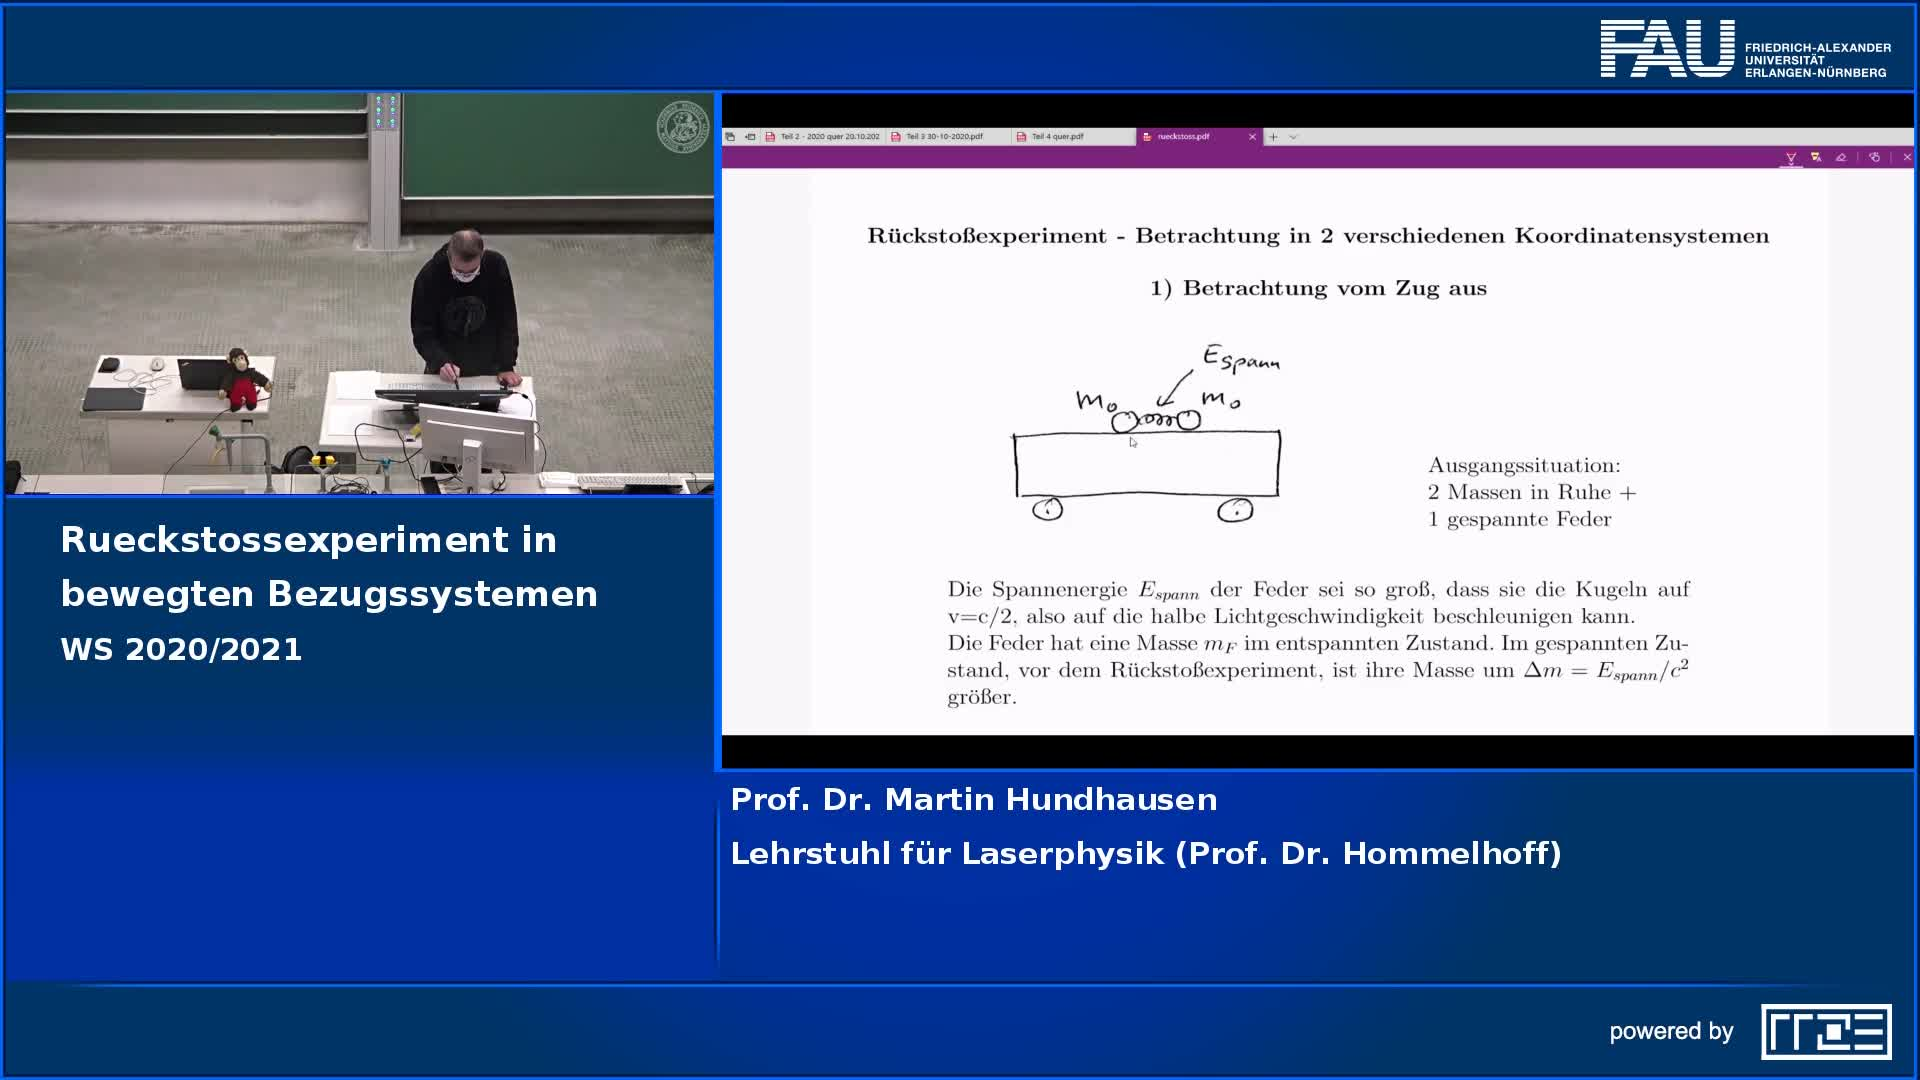 Rückstoßexperiment in bewegten Bezugssystemen preview image